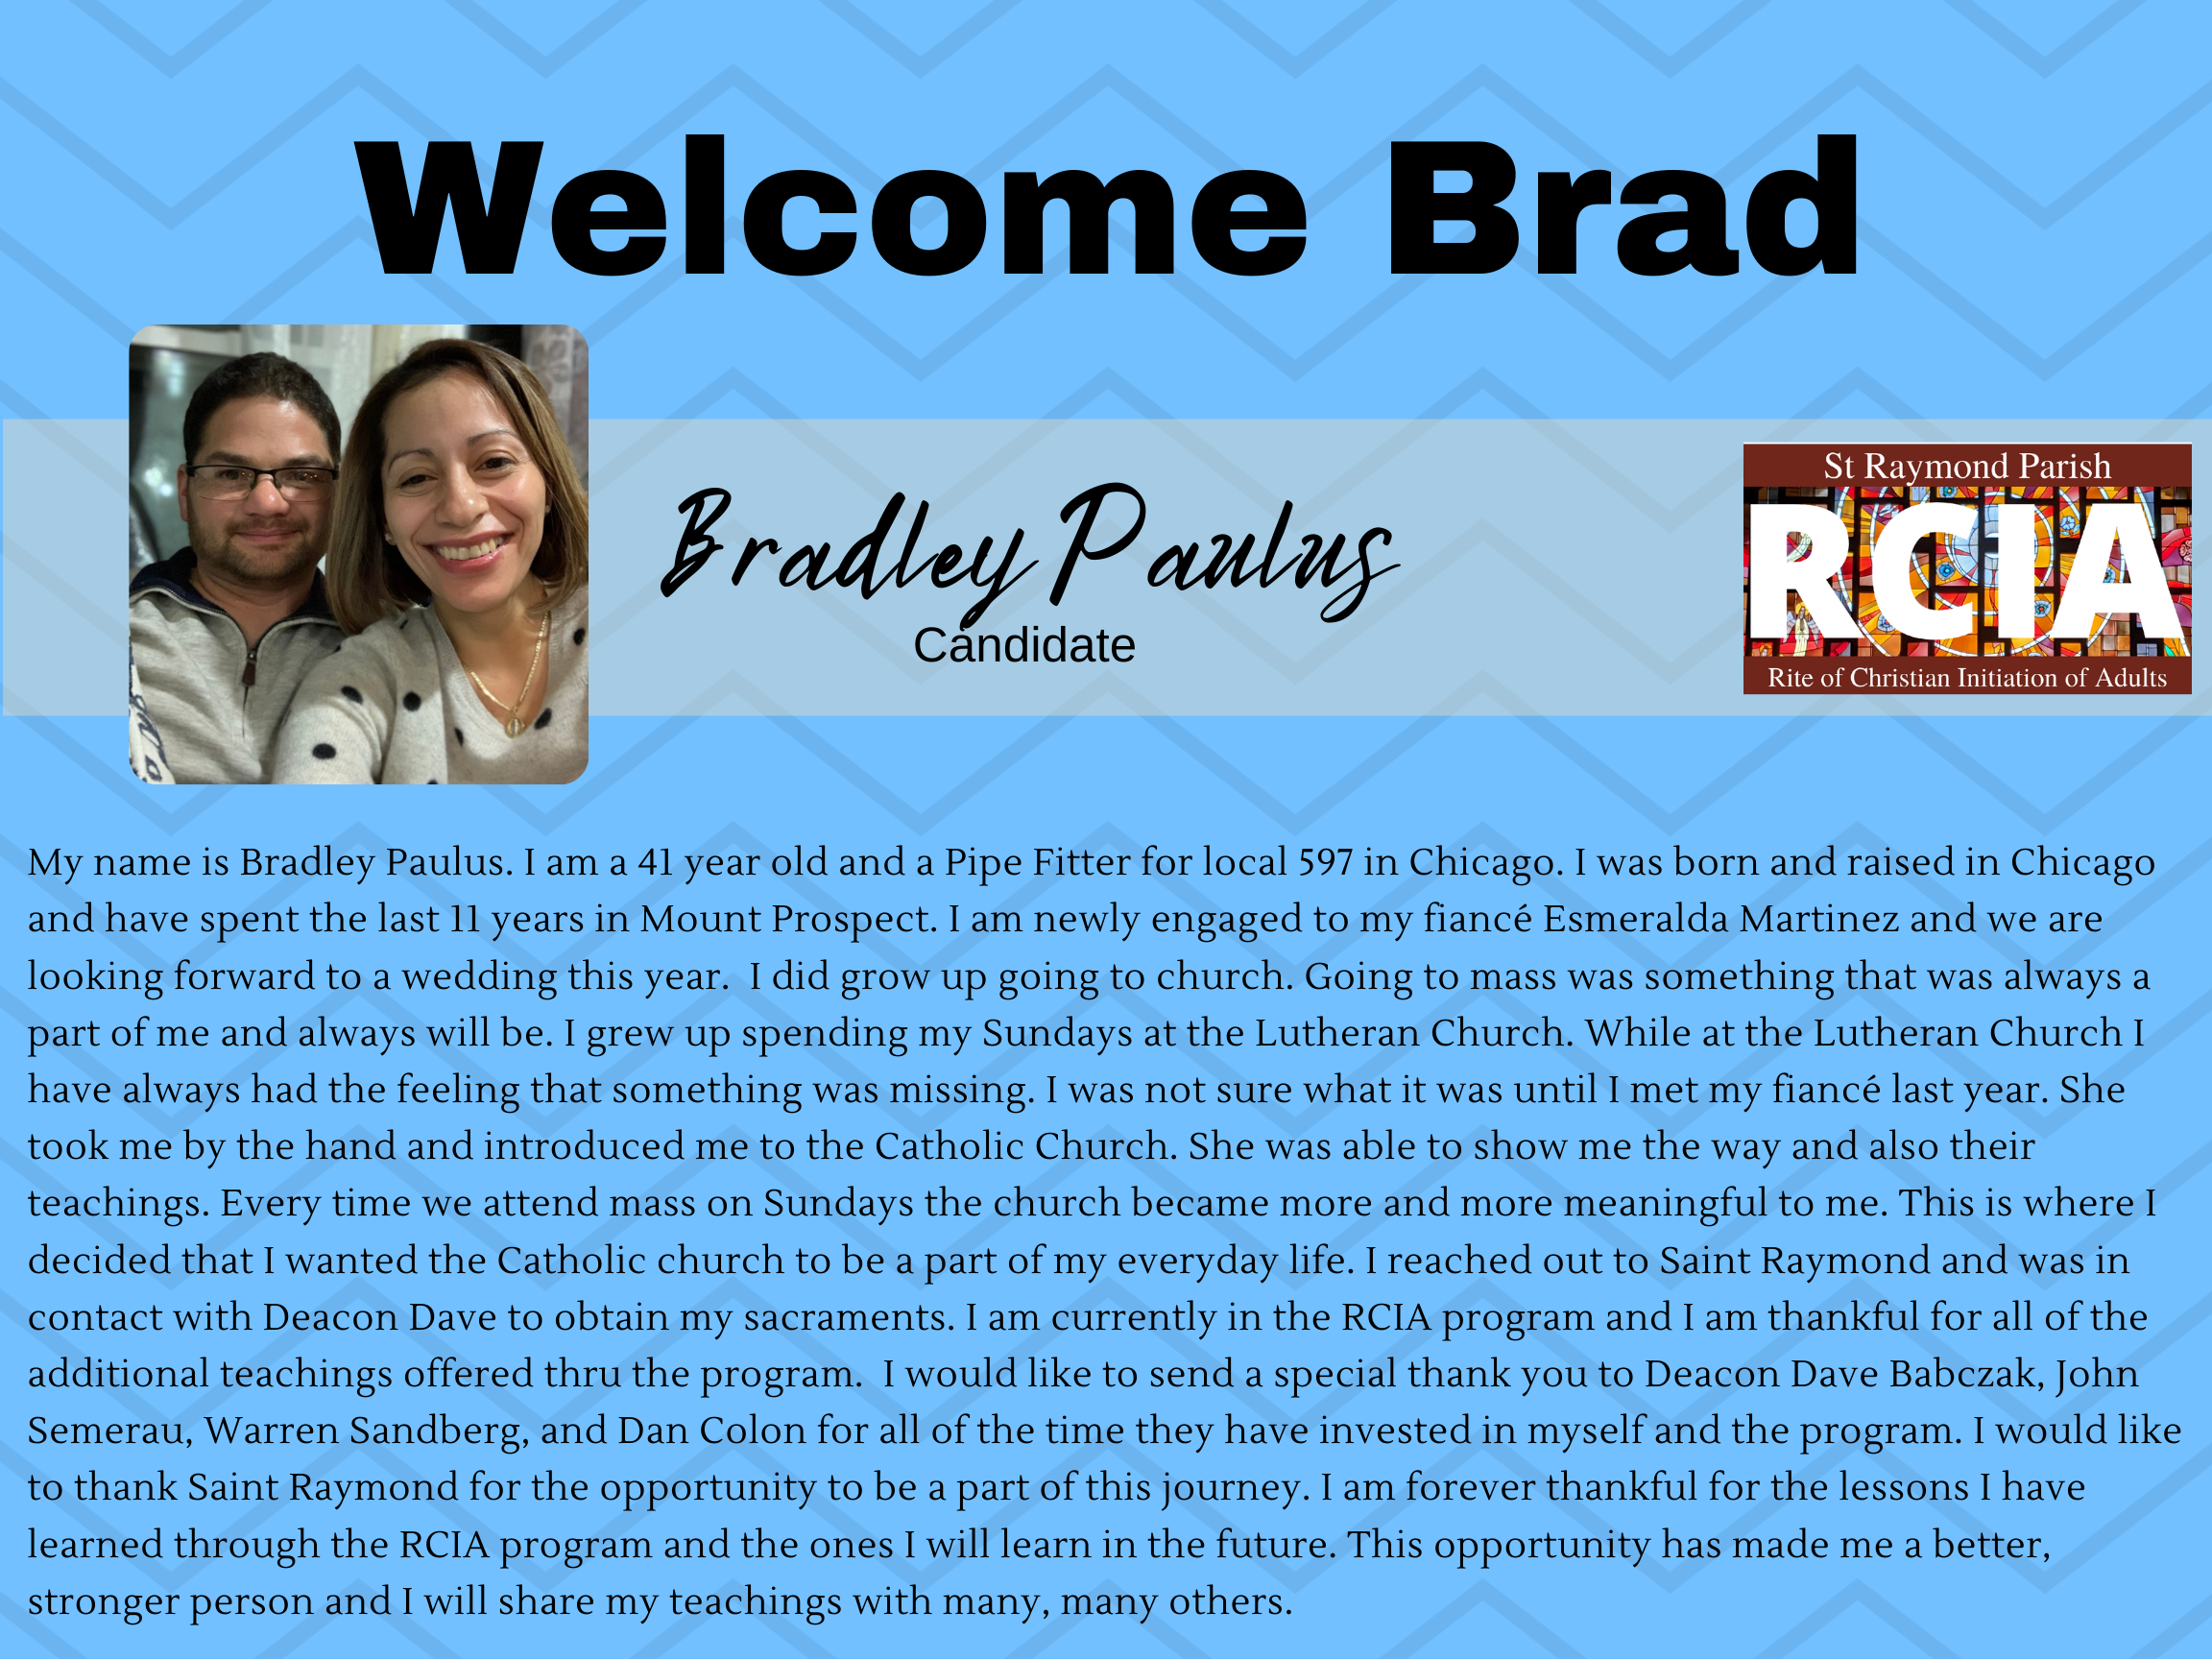 Welcome Brad